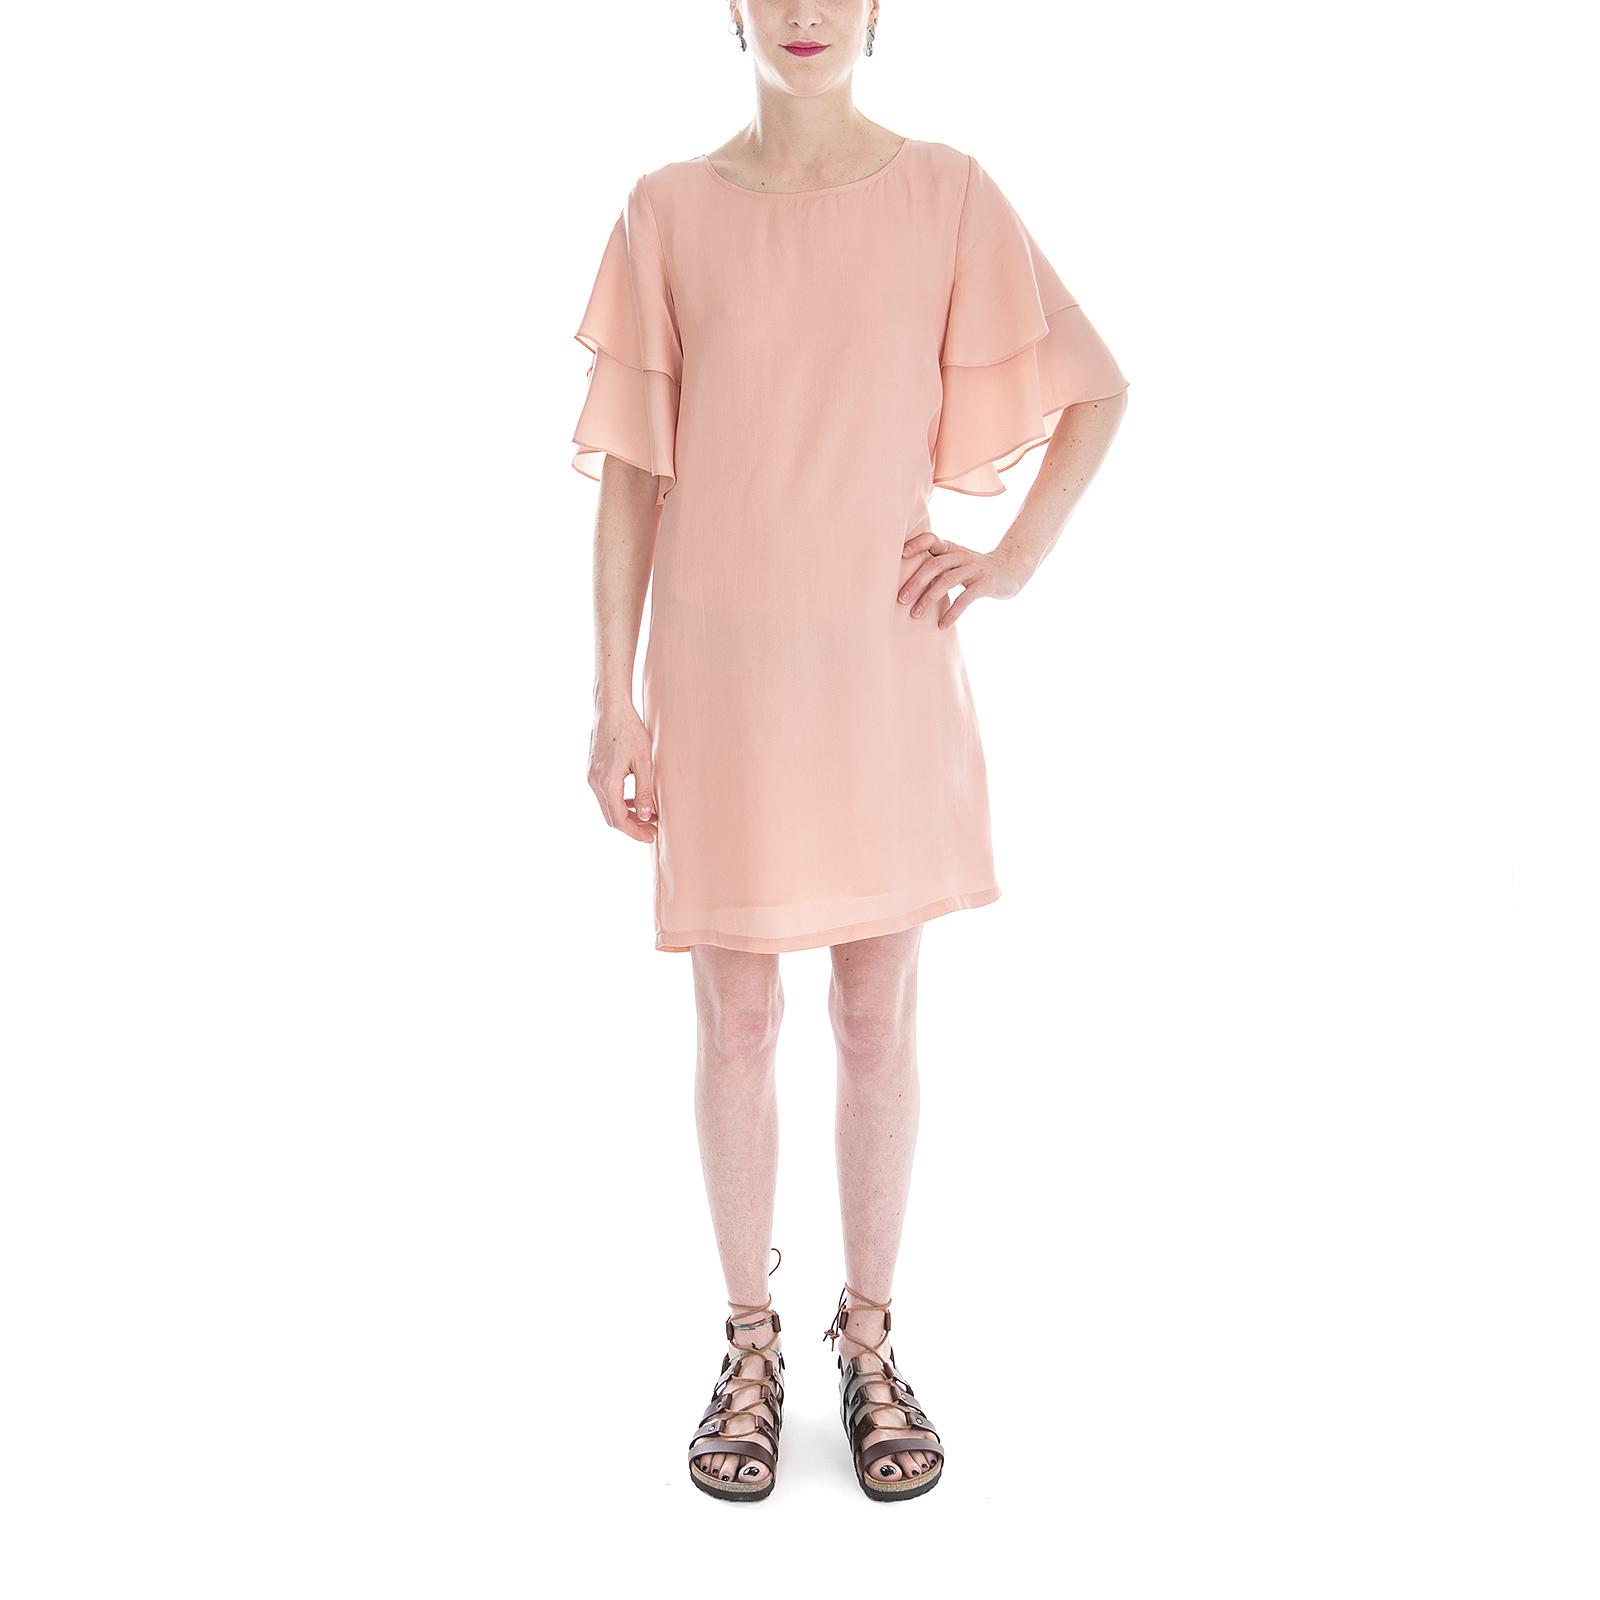 Erla Vestiti 0050 Rosa Minimum Pink Dusty 1n7YqZH